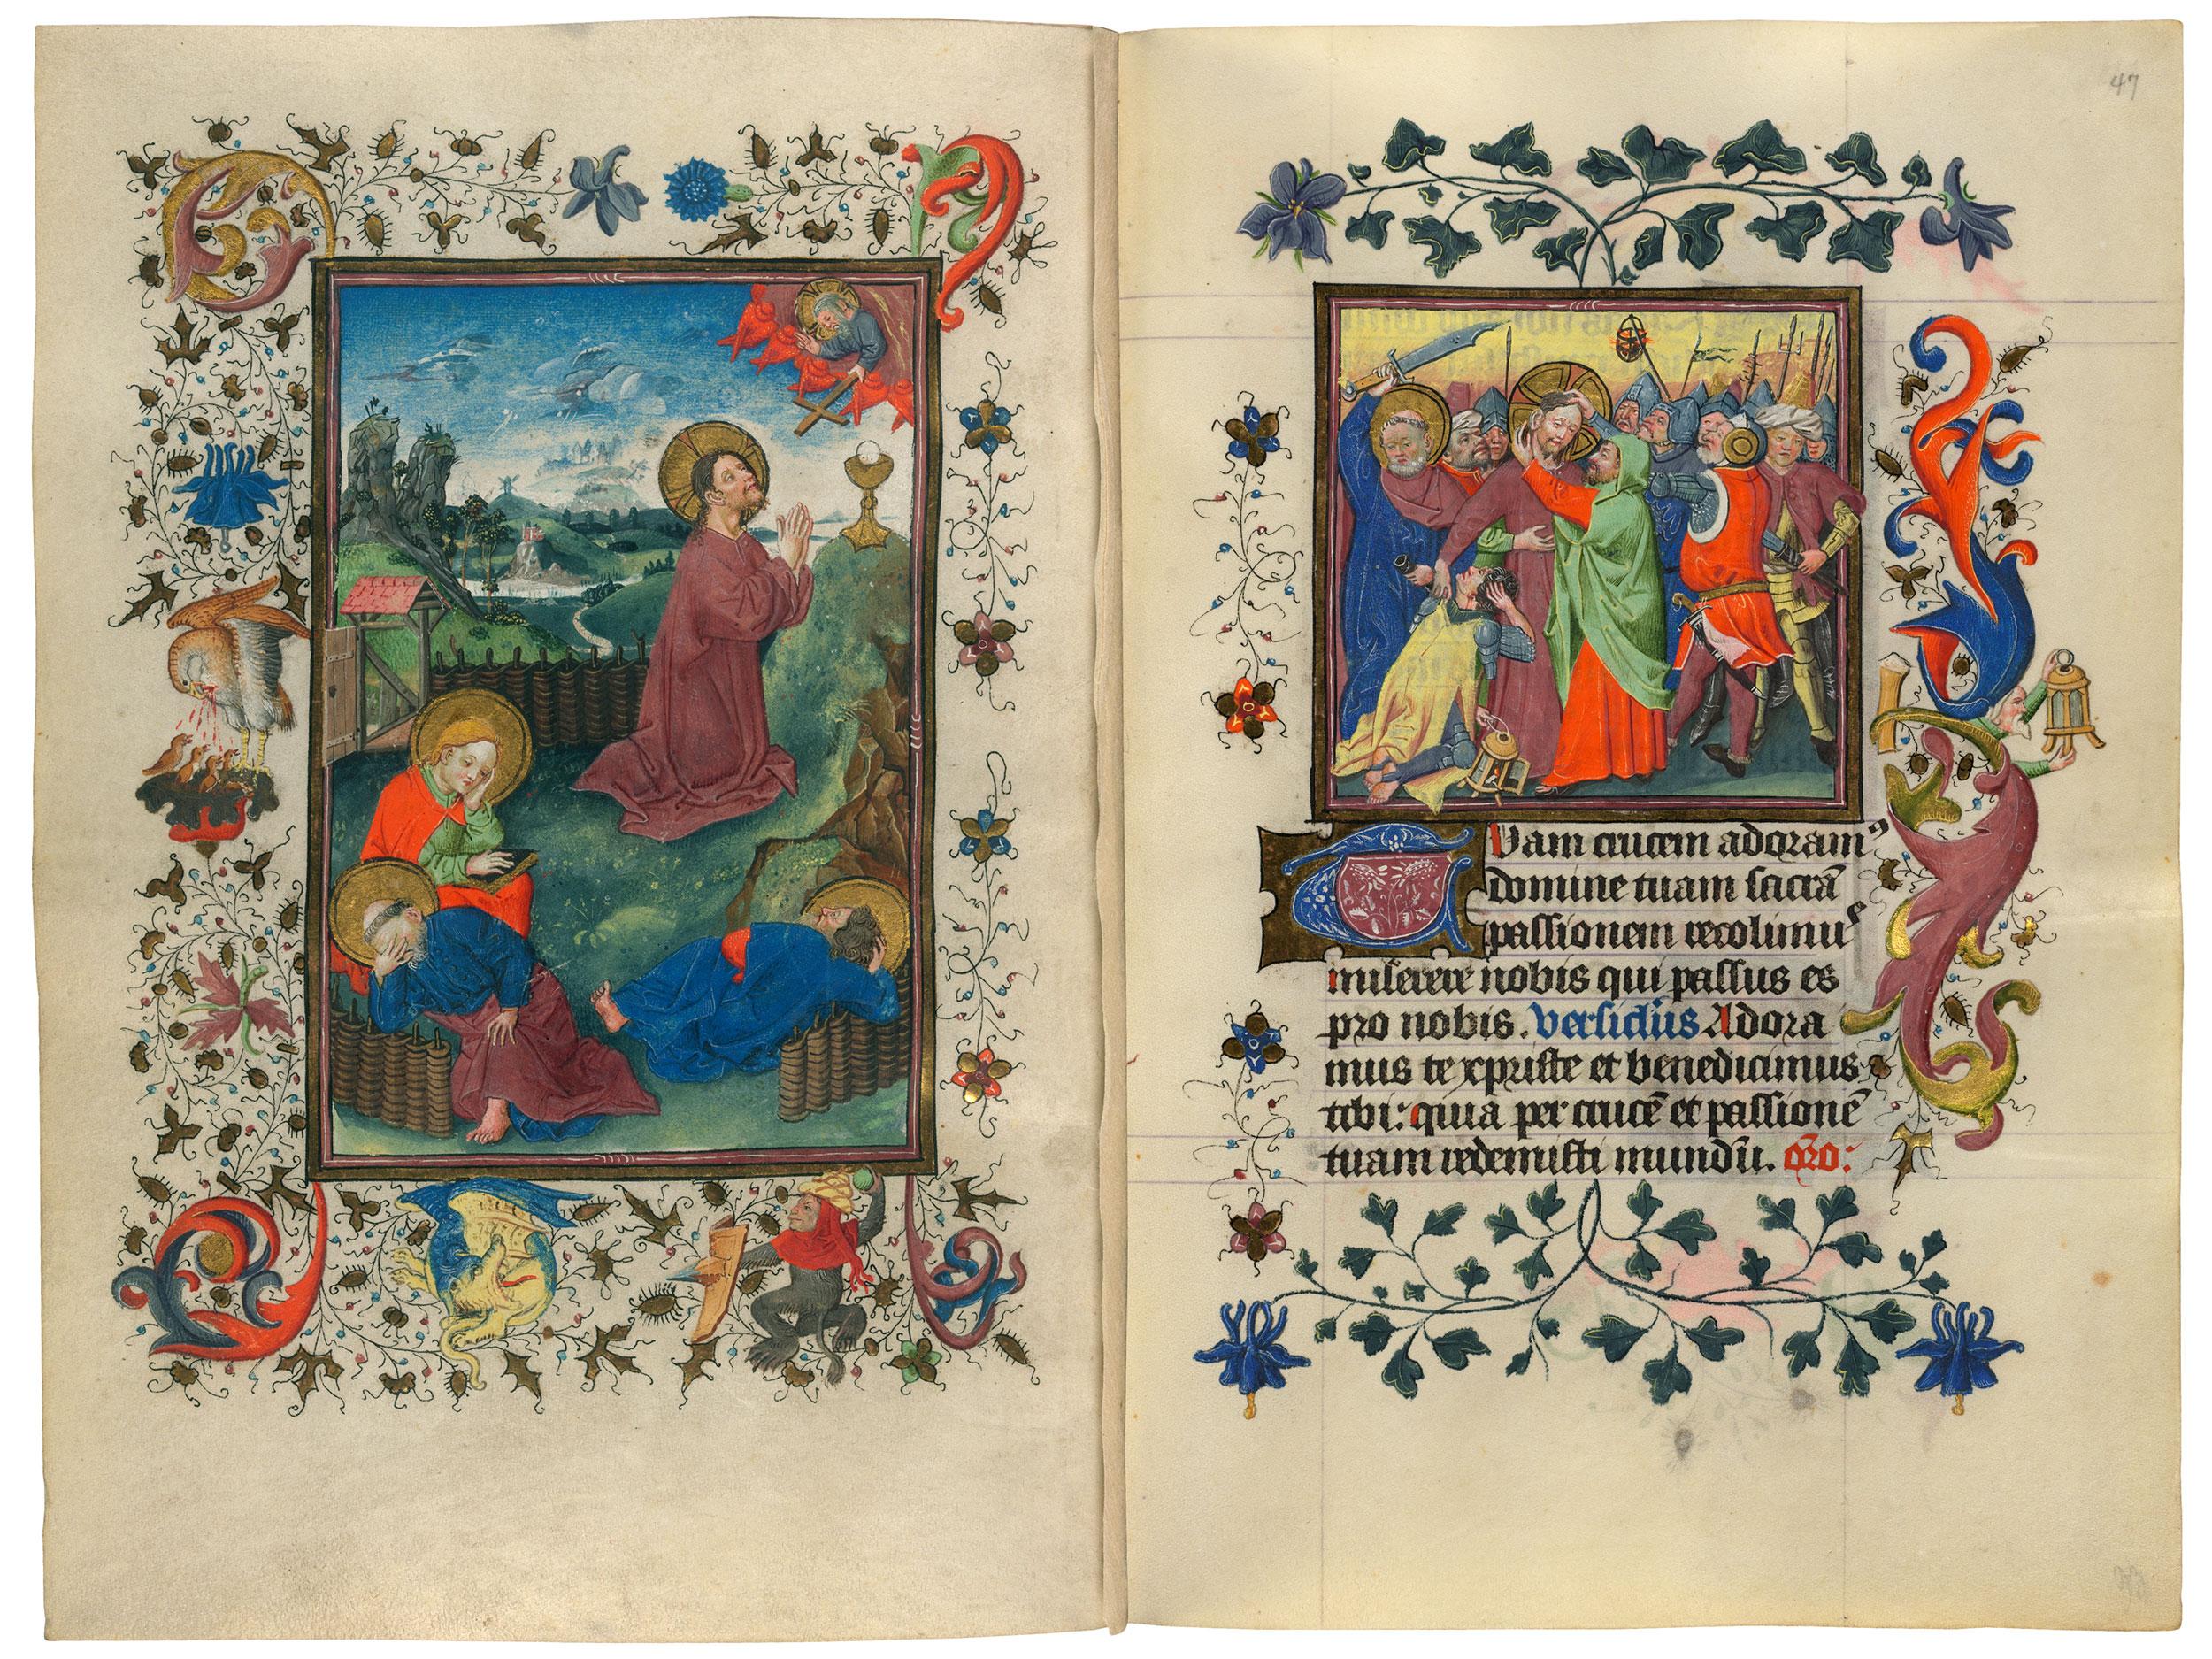 Heures de Catherine de Cleves ca. 1440 Morgan MS M.917-945 fol 47r,